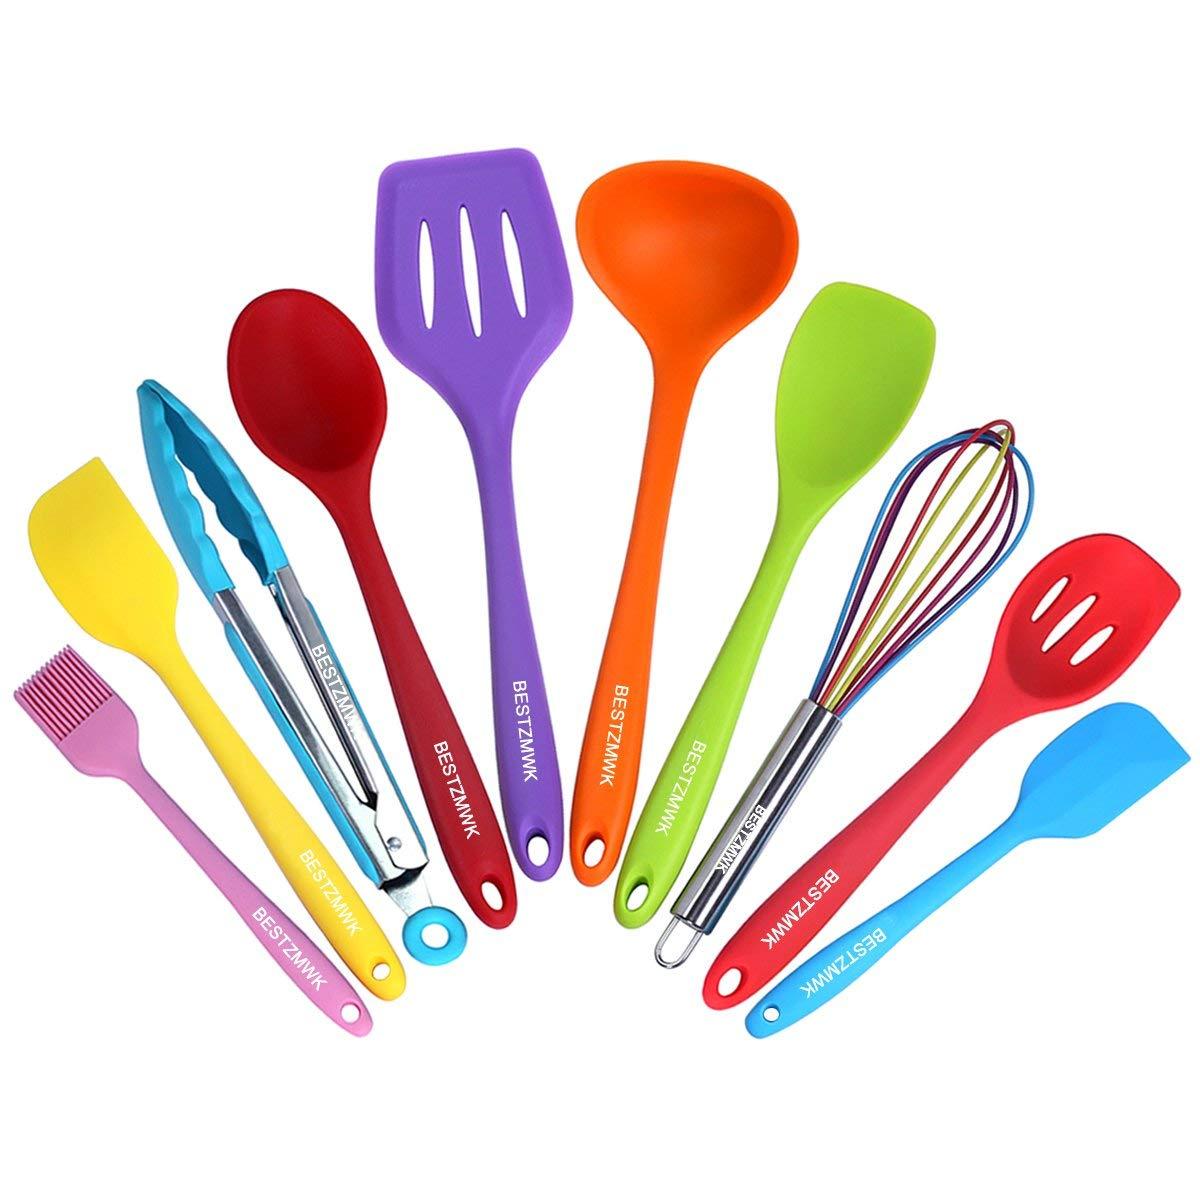 BESTZMWK Kitchen Utensil Set - 10 Cooking Utensils - Colorful Silicone Kitchen Utensils - Nonstick Cookware with Spatula Set - Colored Best Kitchen Tools Kitchen Gadgets